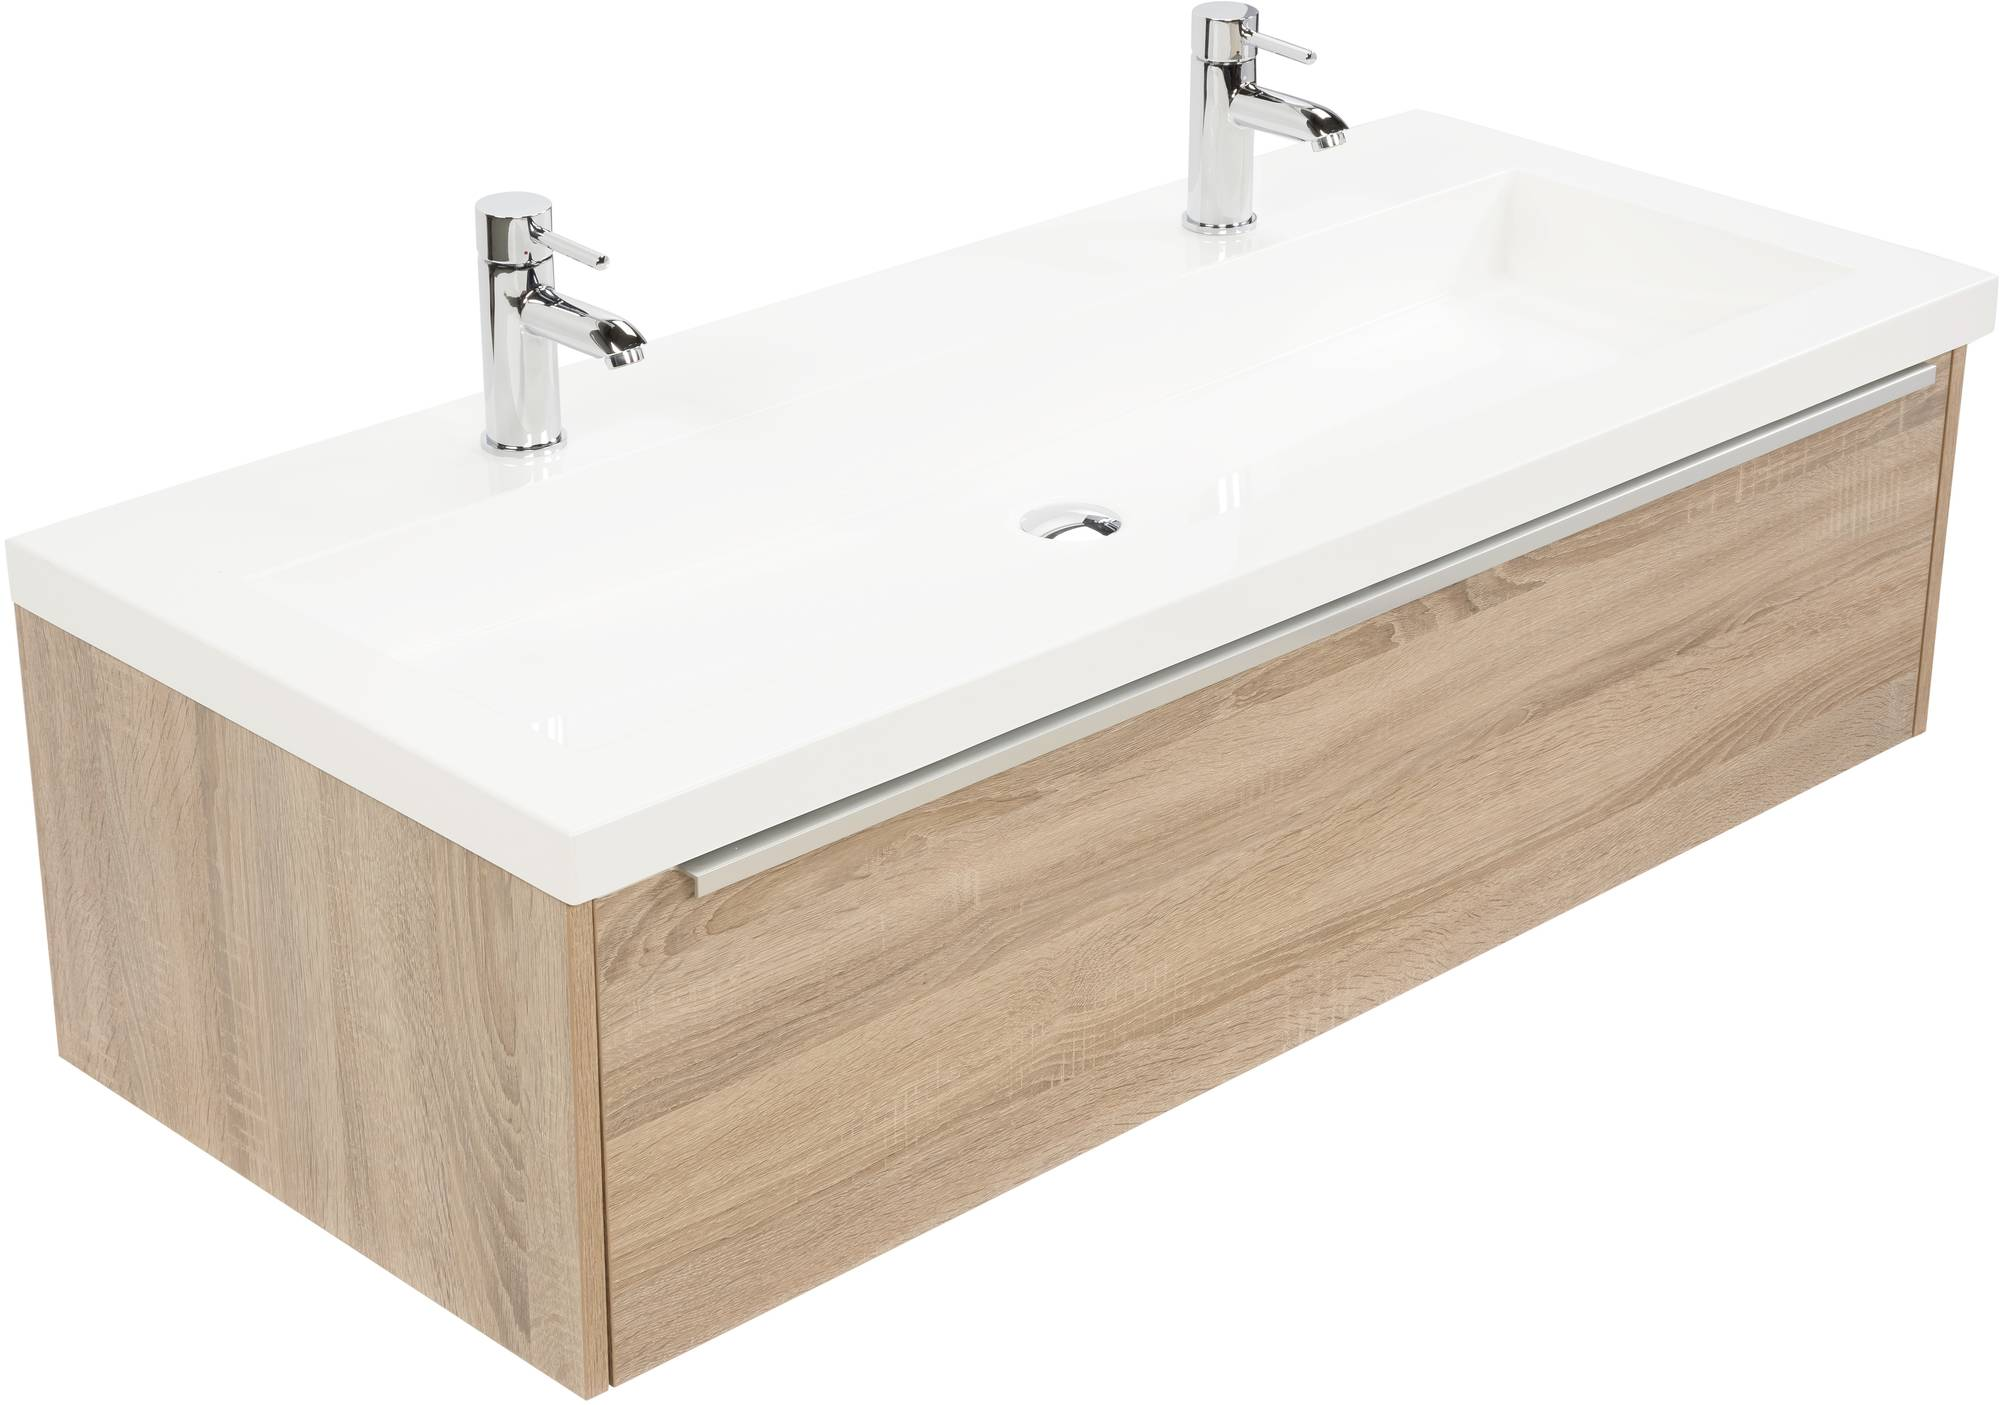 Saniselect Socan meubelset 1 lade met mineraalmarmere wastafel 120cm Bardolino Eiken